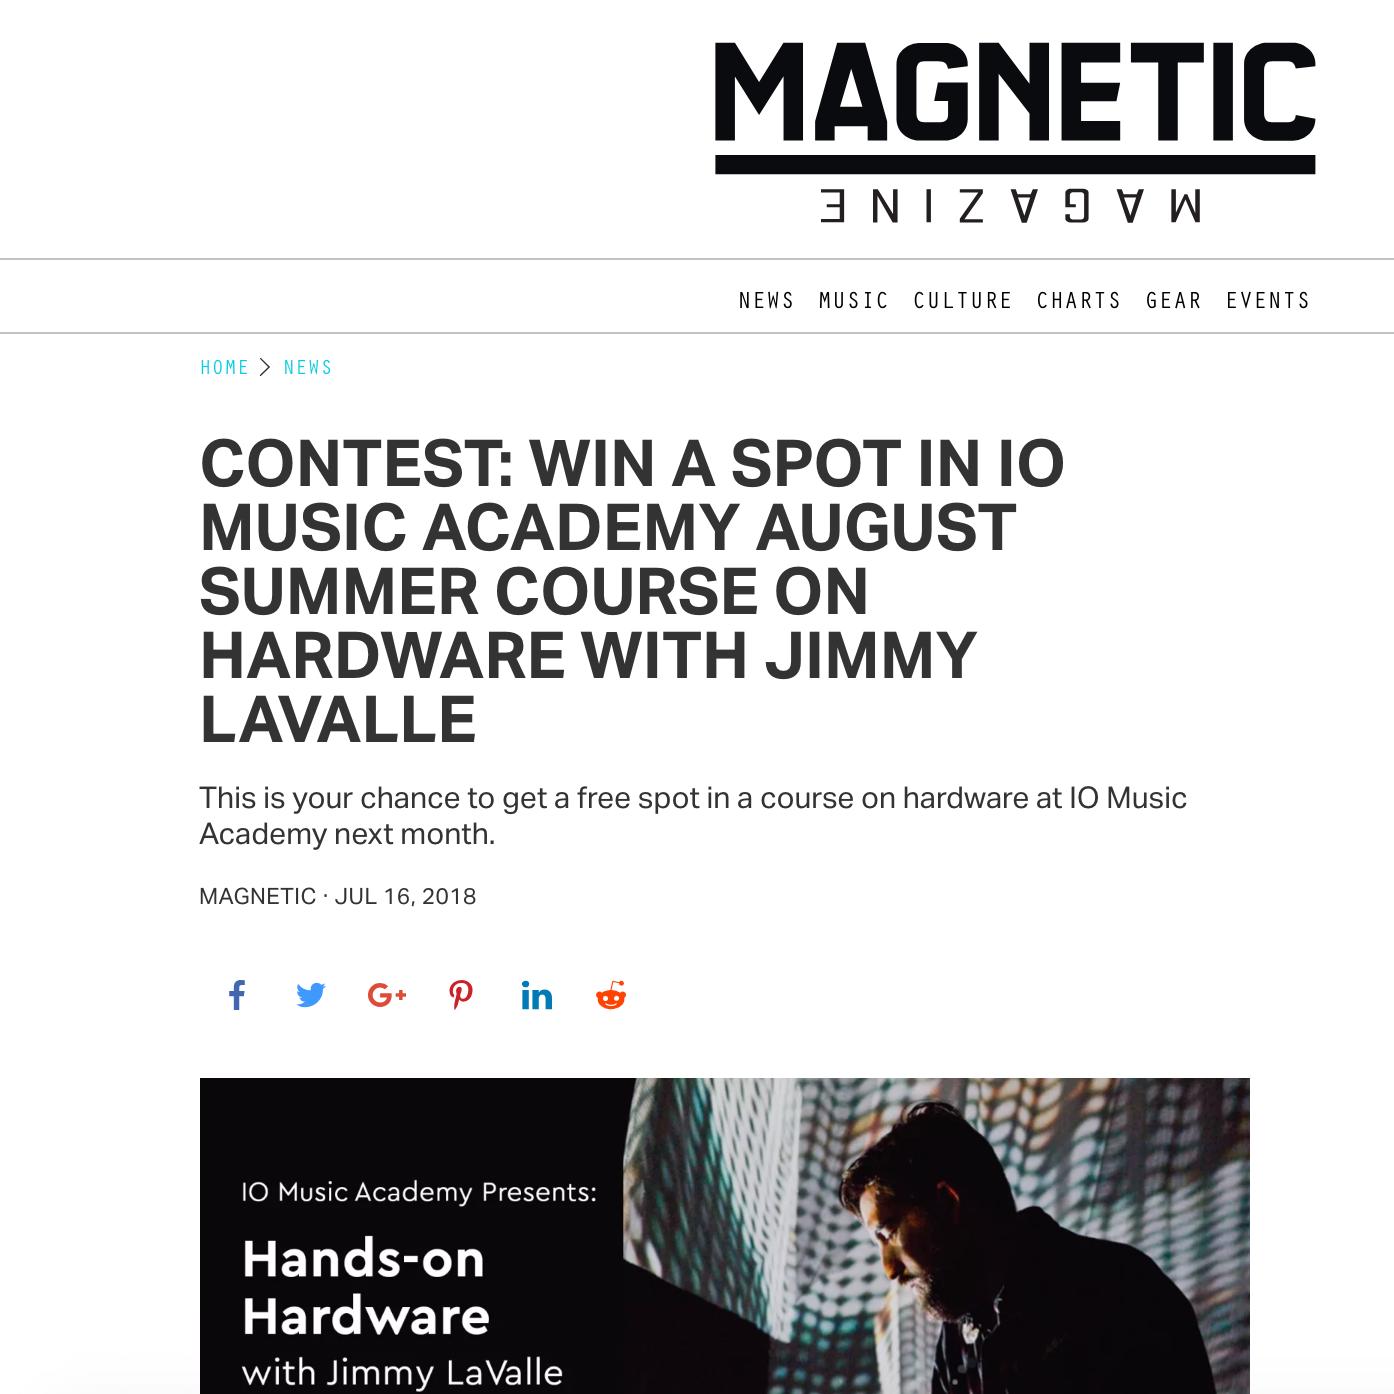 Magnetic_HandsOnHardware